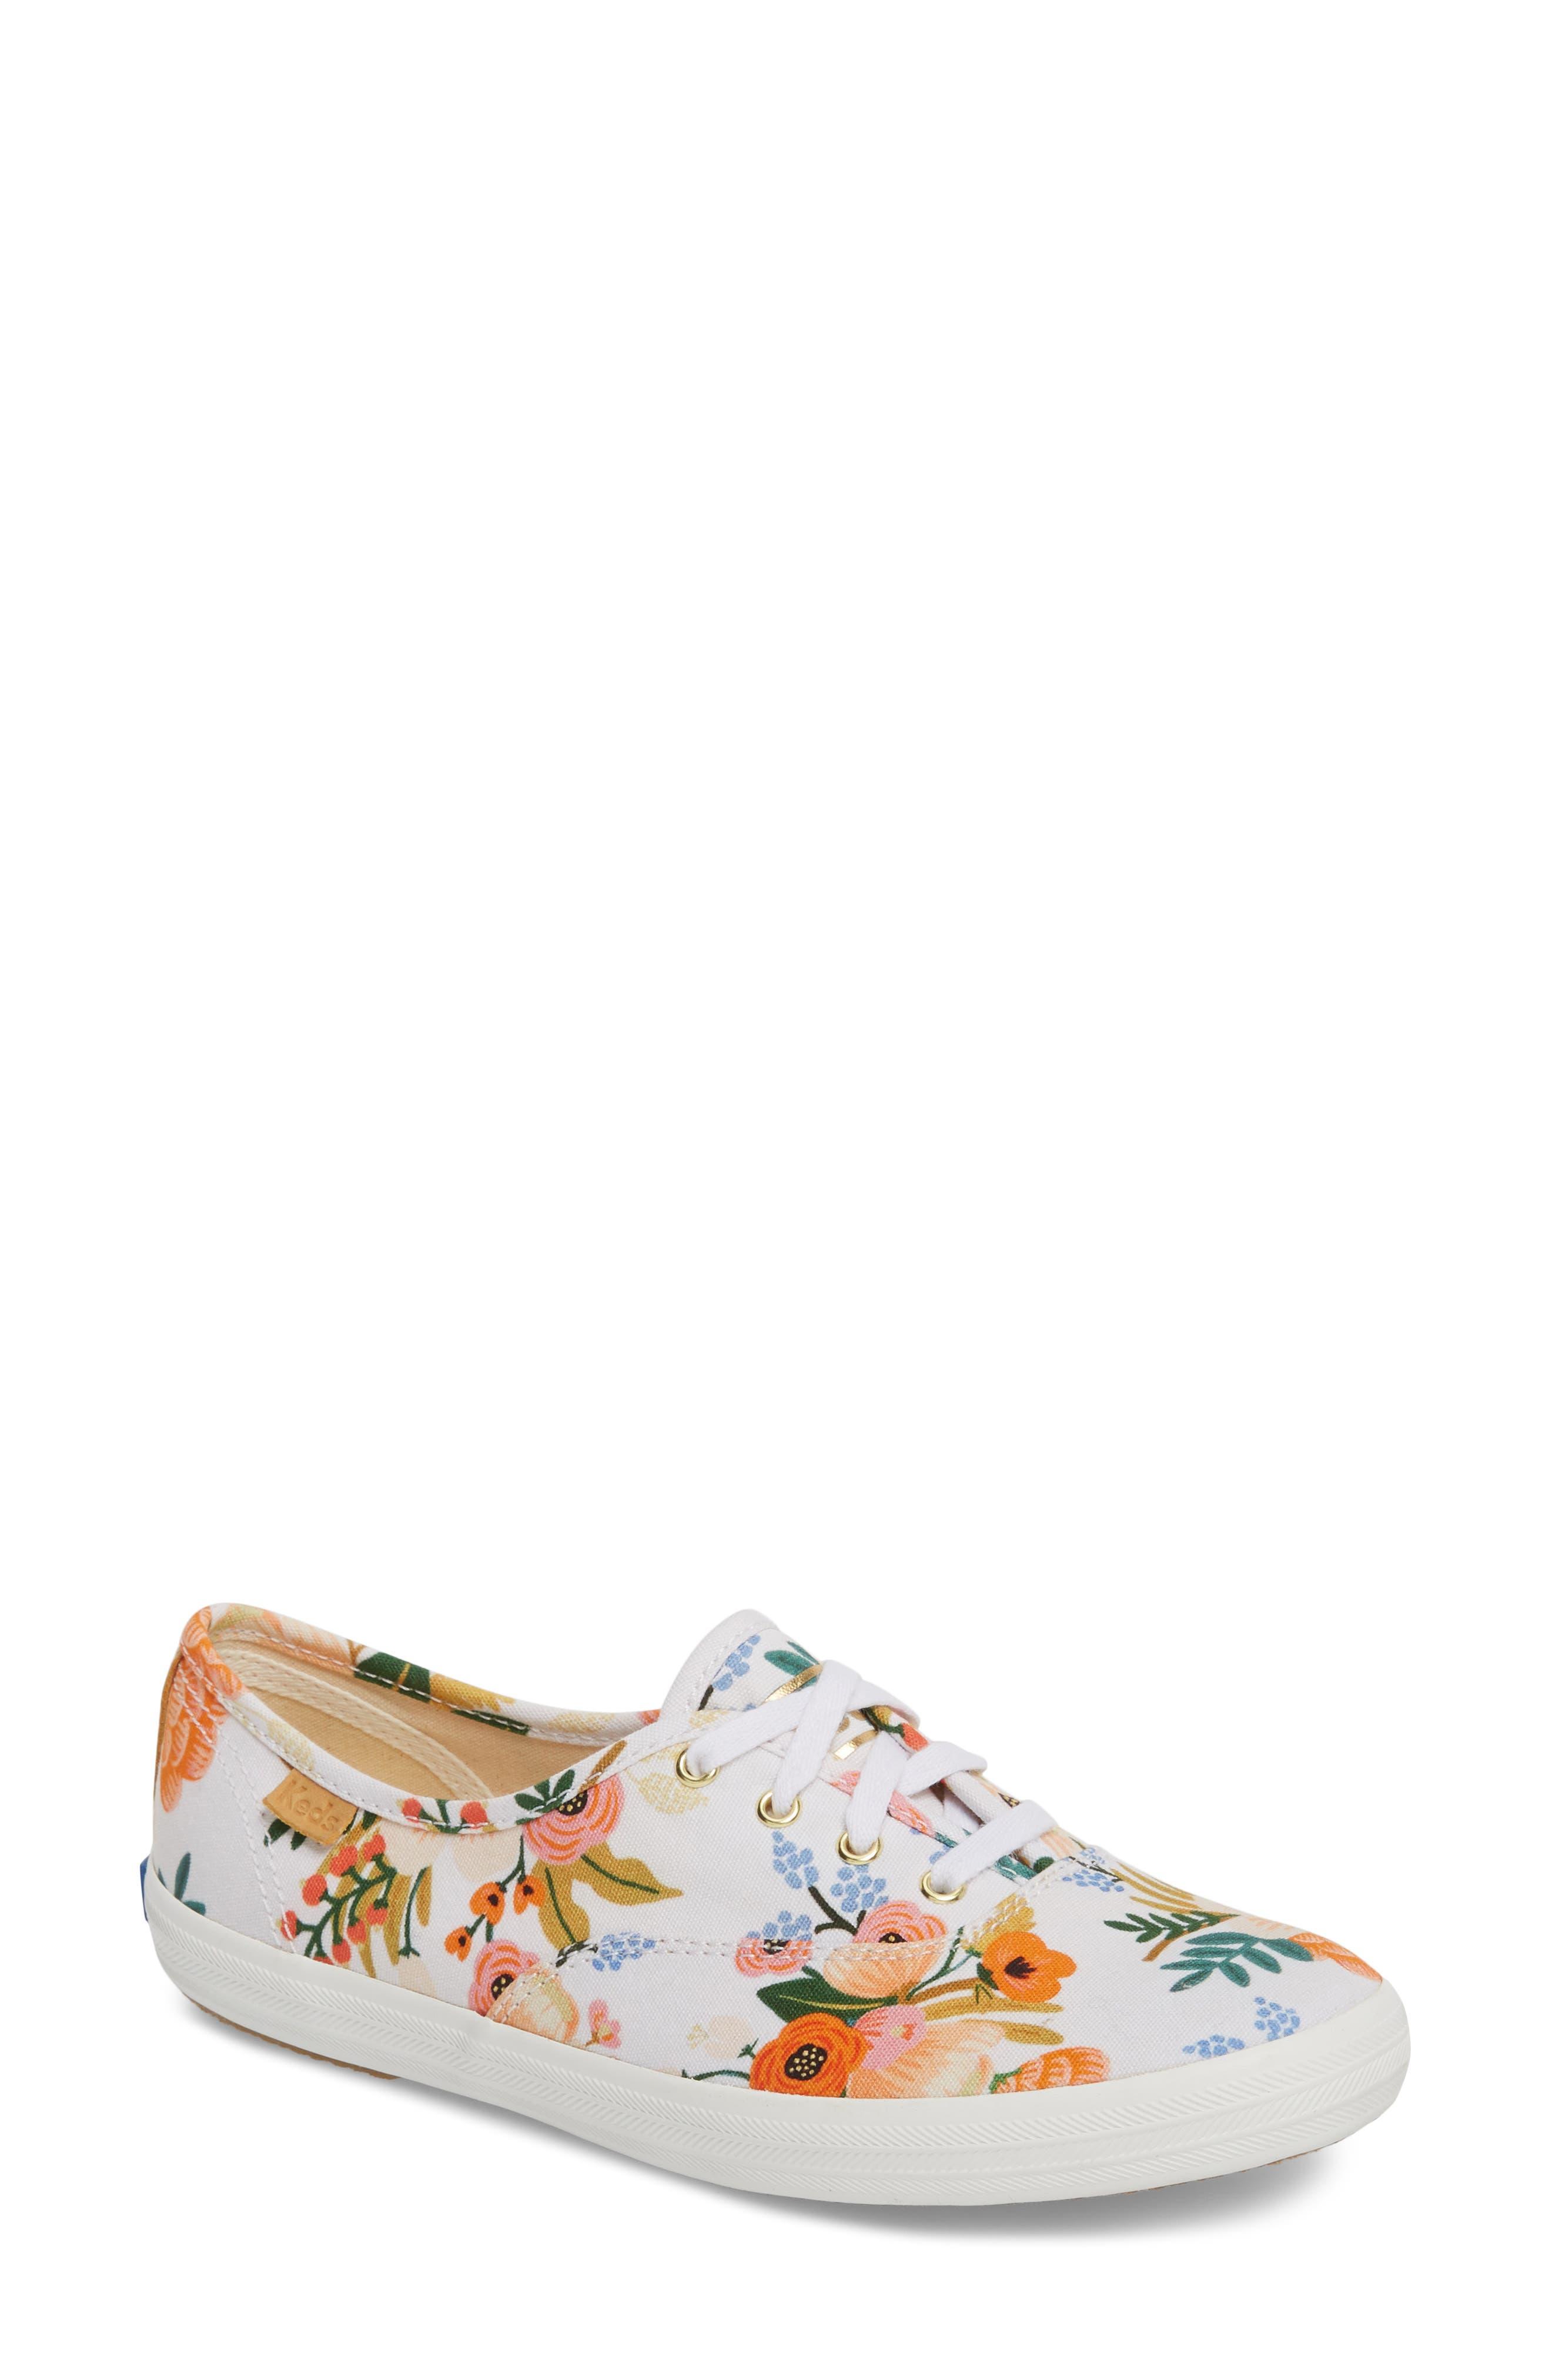 x Rifle Paper Co. Champion Floral Print Sneaker,                         Main,                         color, WHITE